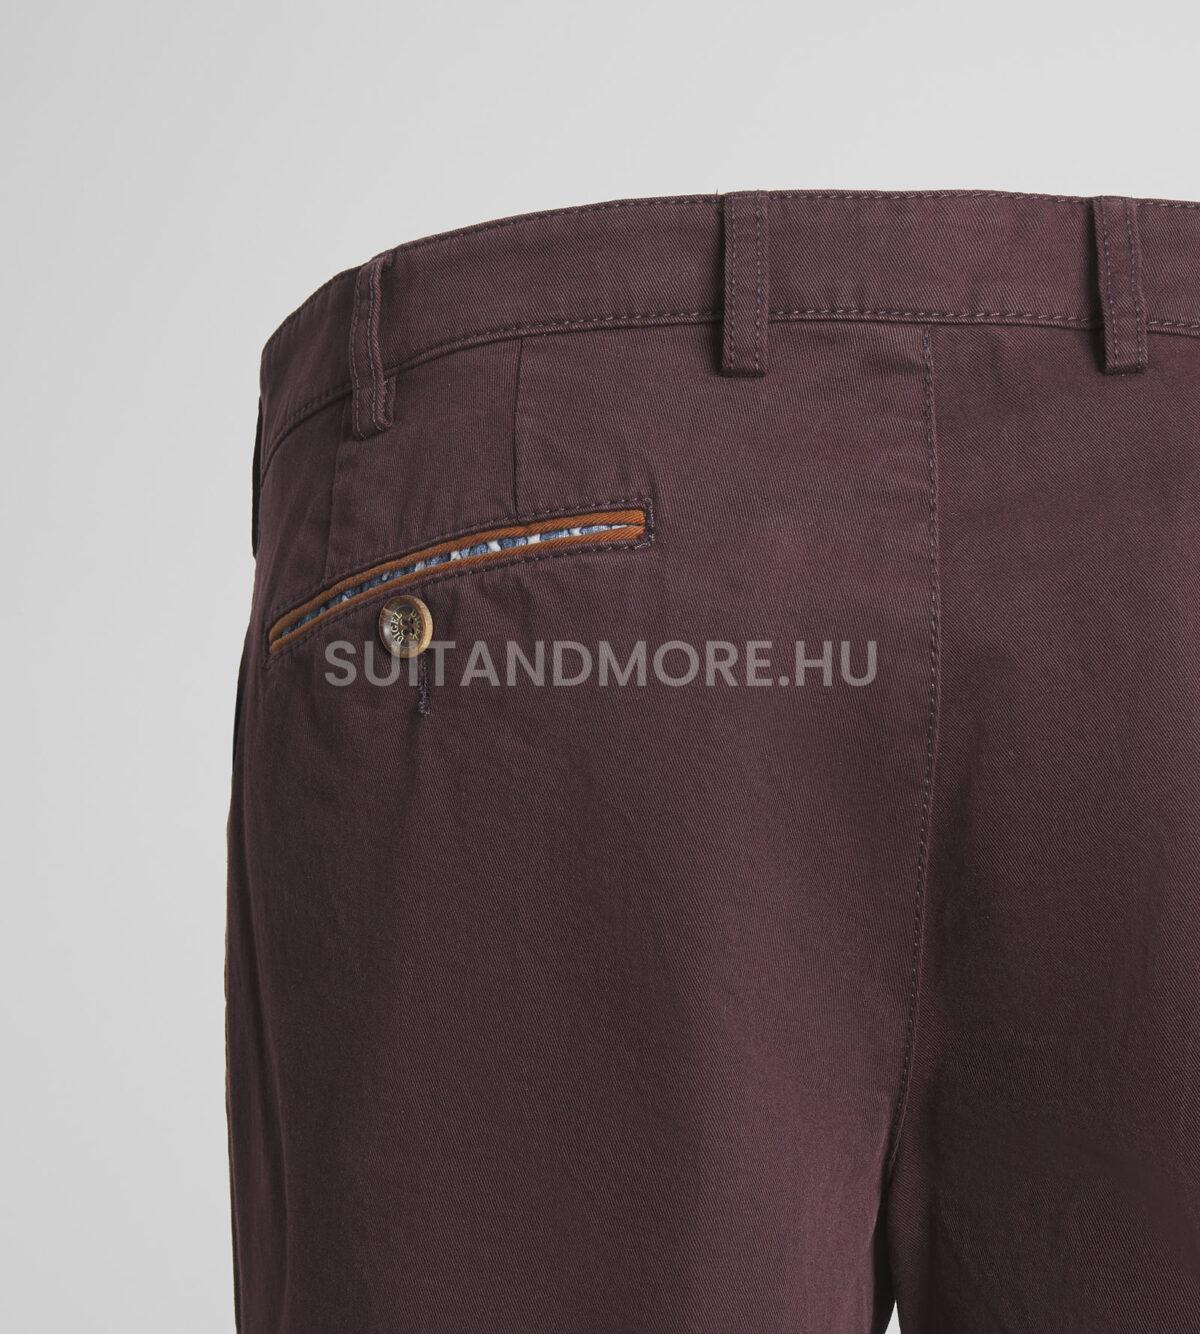 bordó-modern-fit-pamut-sztreccs-chino-nadrág-LOGAN-F-88160-65-03